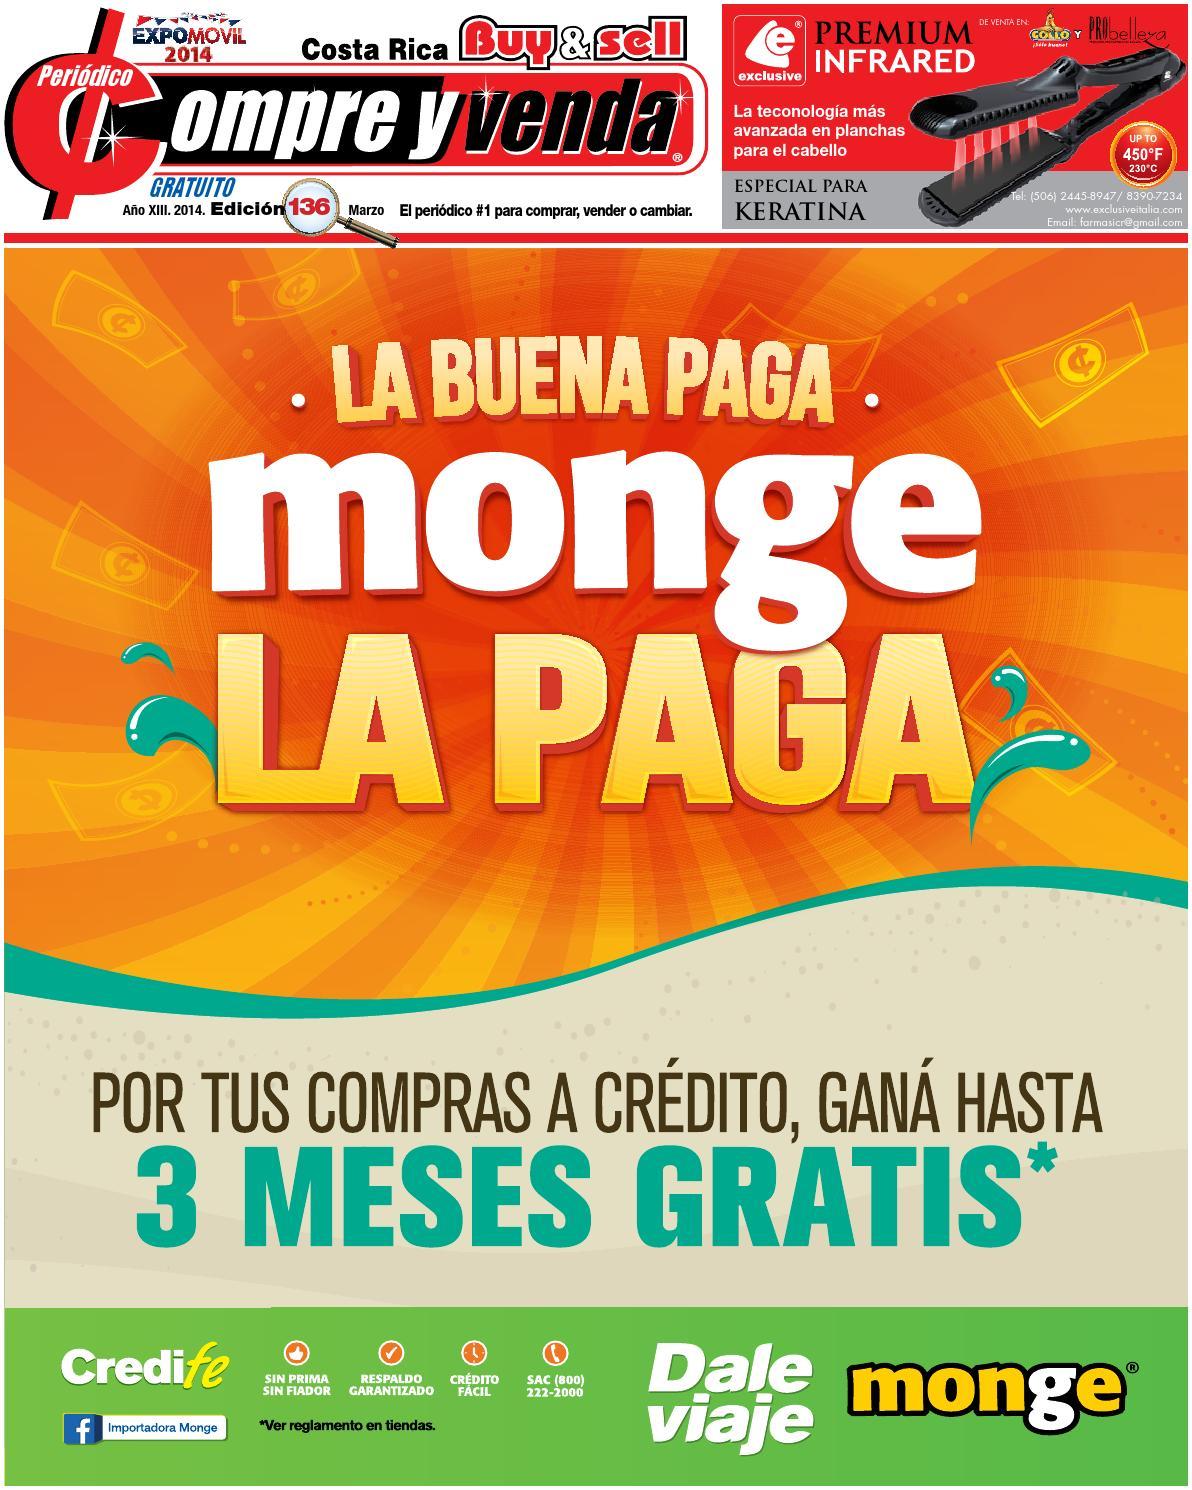 97f8e15c Periódico Compre y Venda edi #136 mes Marzo Expomóvil by Magic Medias S.A.  - issuu